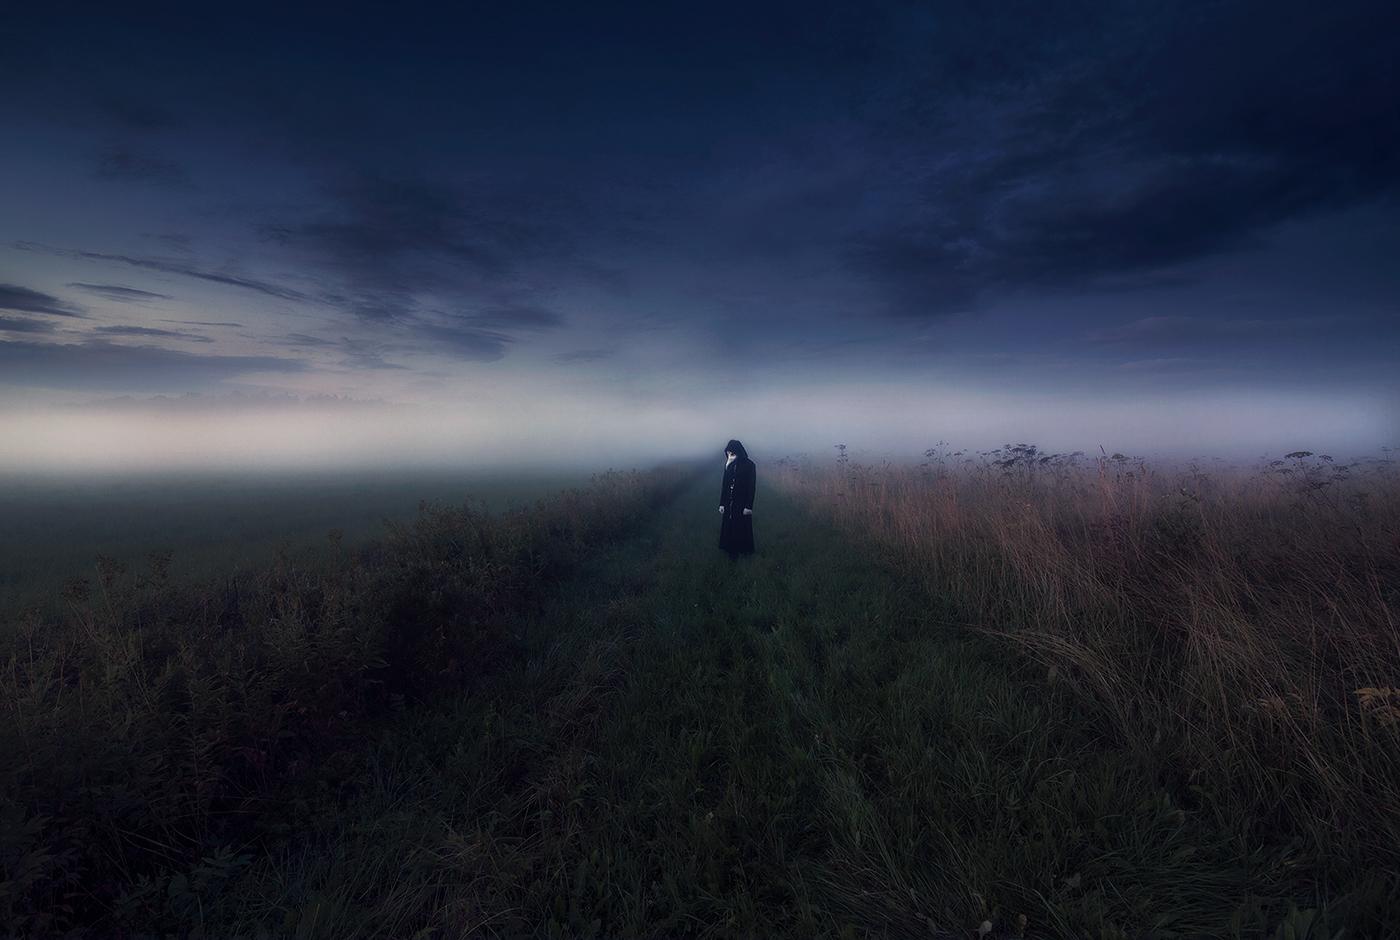 Times of epidemics / фотограф Mika Suutari